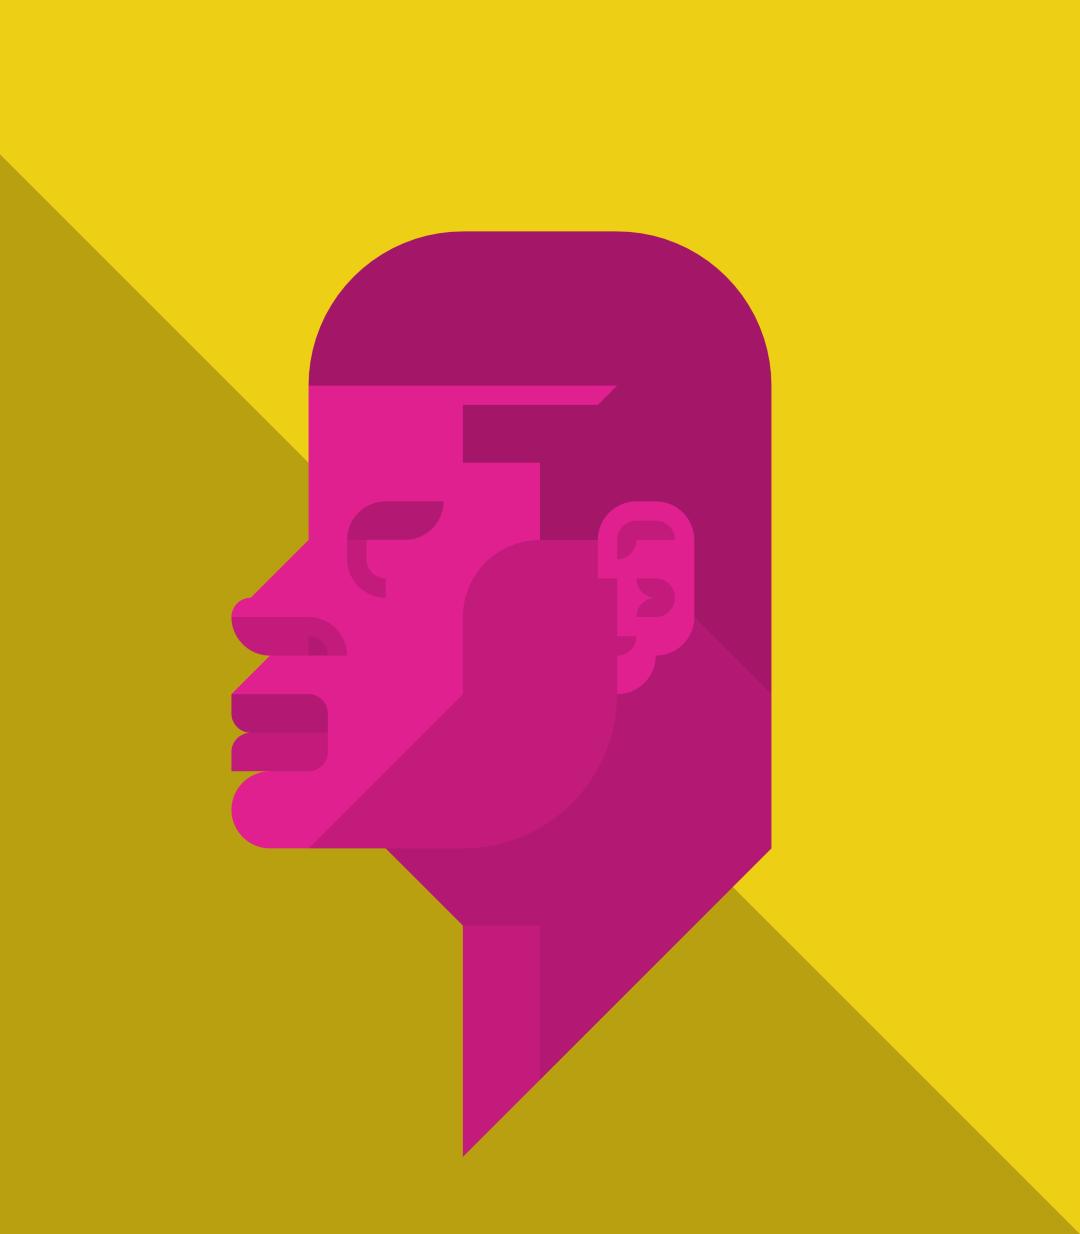 Profile of man #1